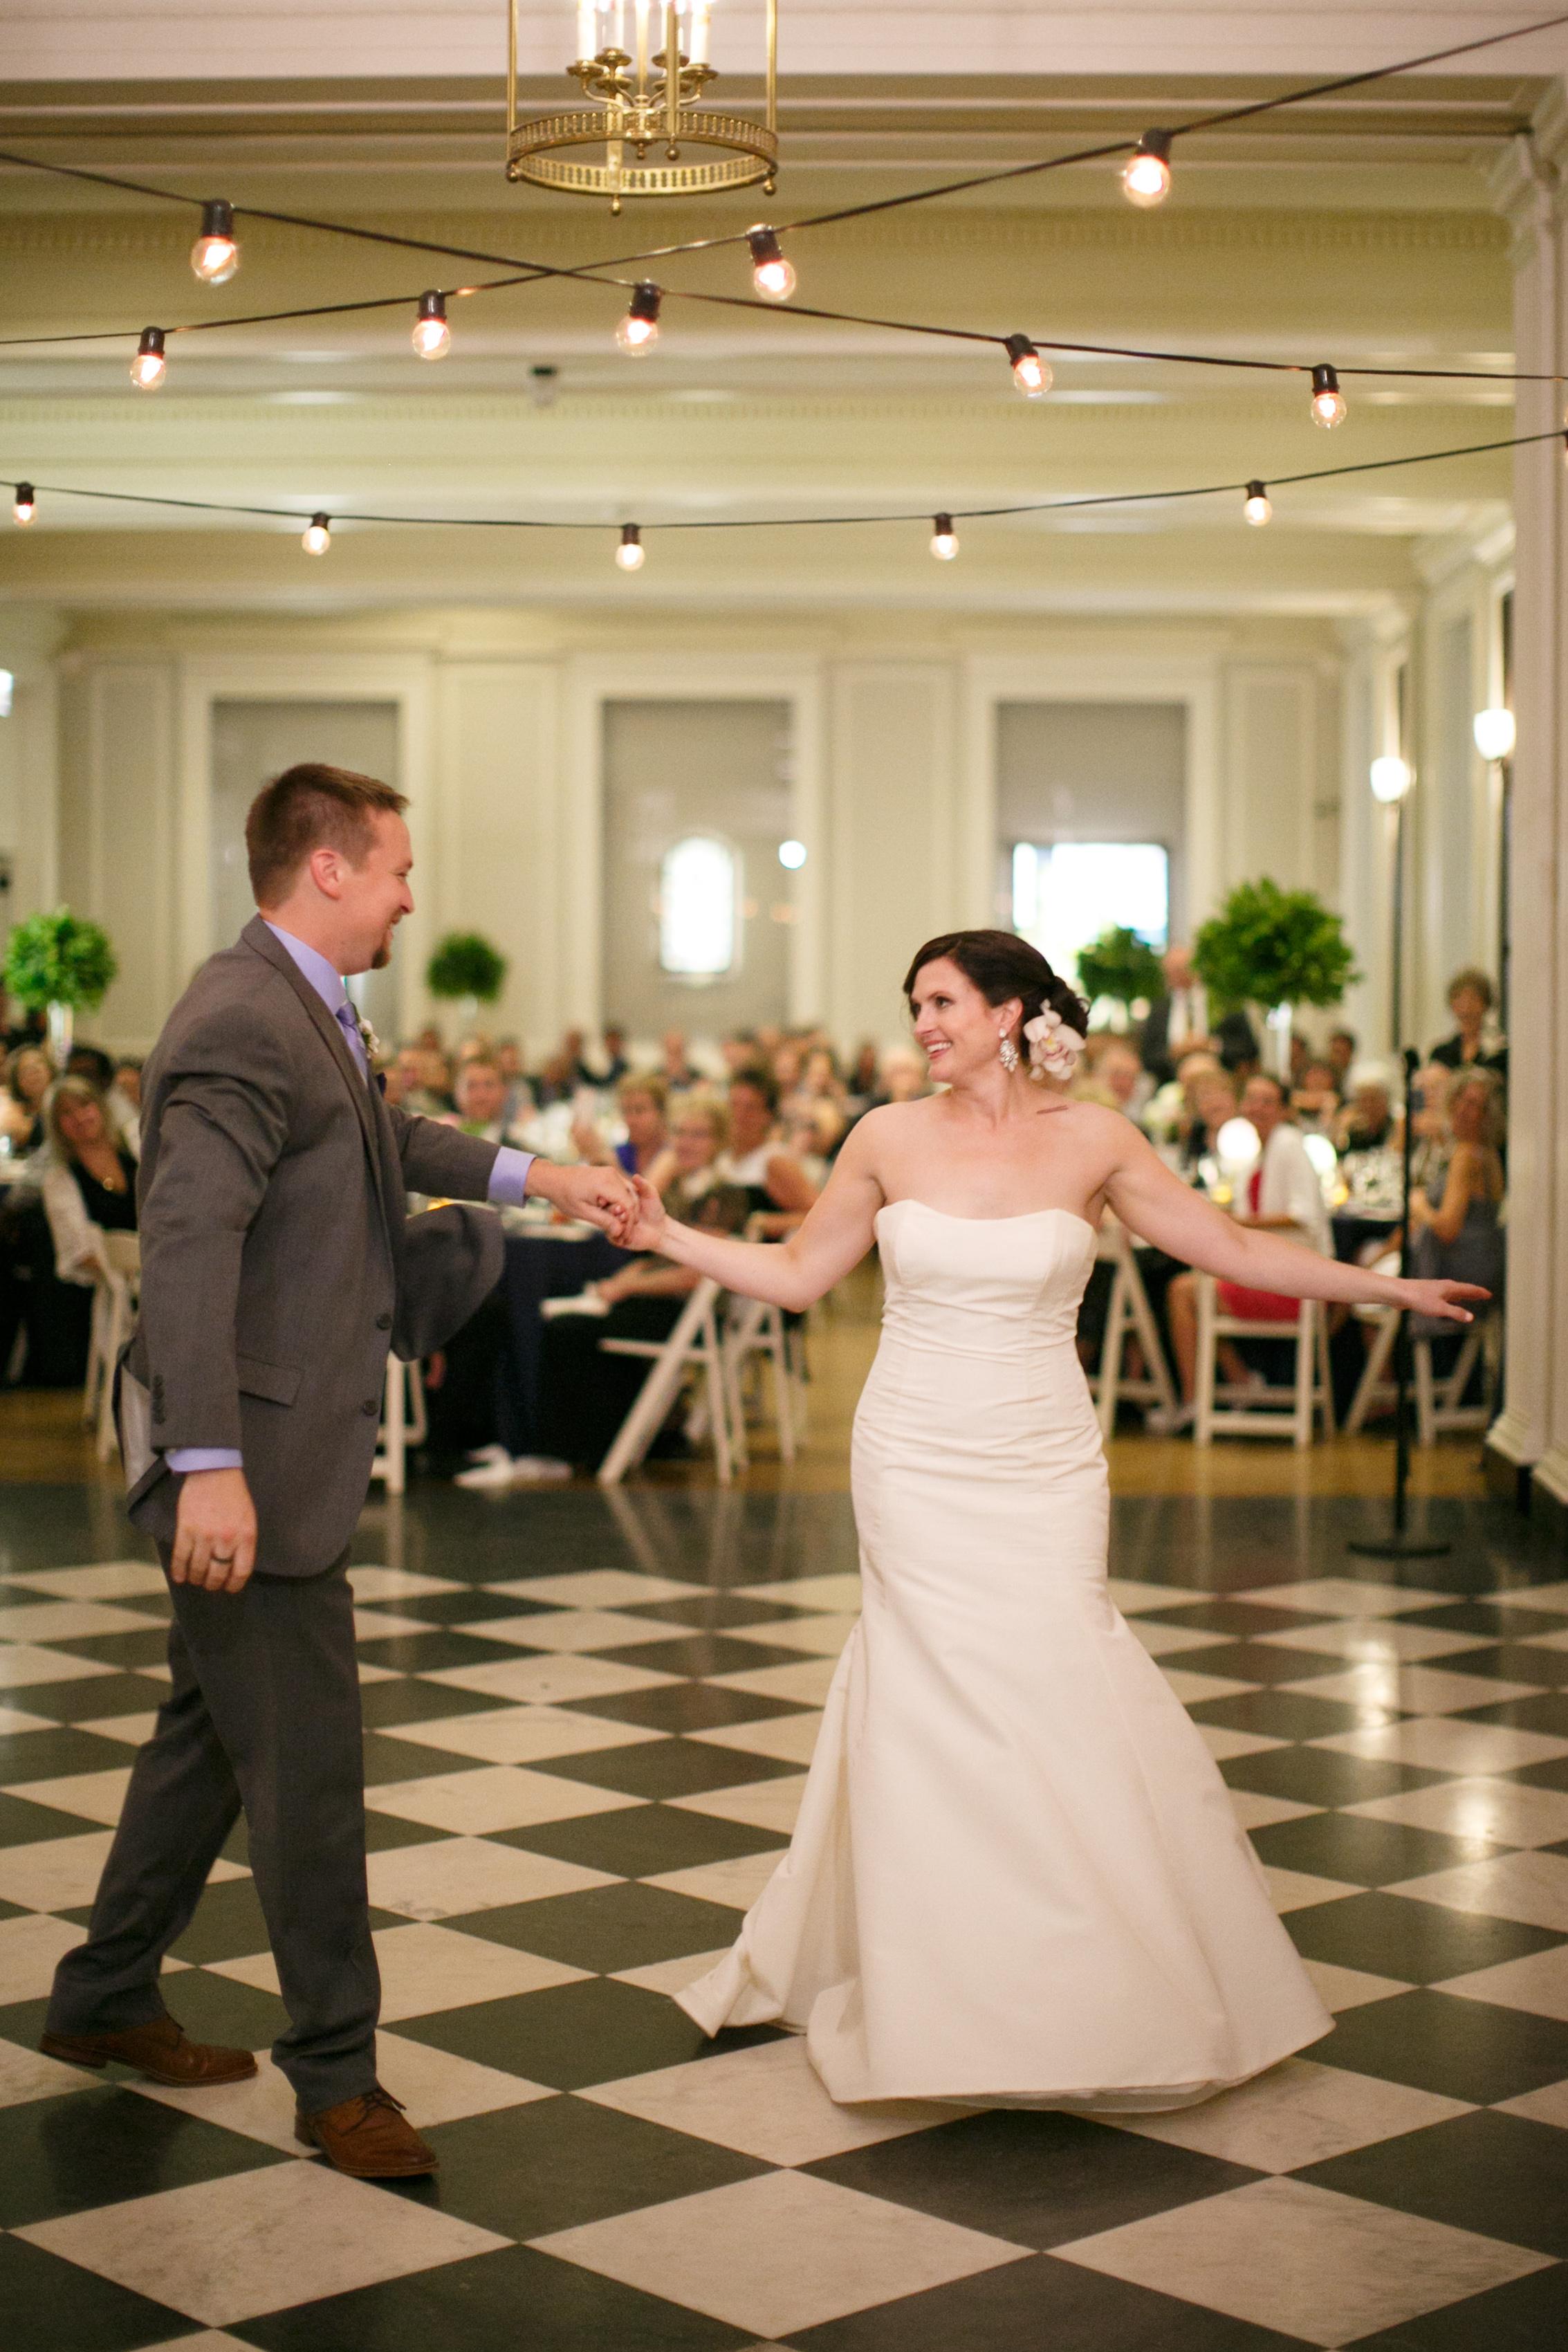 wedding-dance-chicago-history-museum.jpg